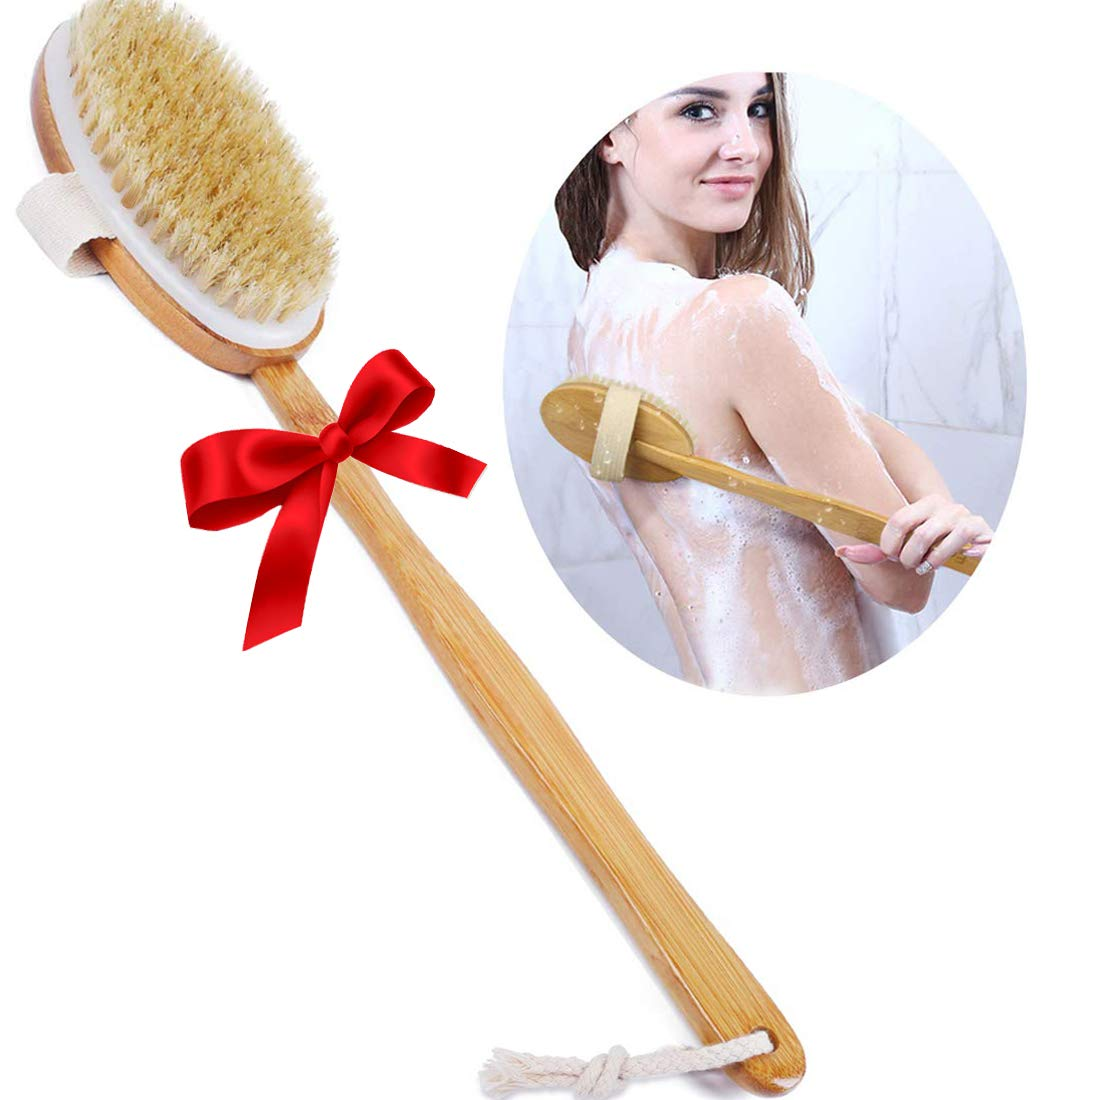 Ybj-ake Choice Nippon regular agency Shower Brush Bath Dry Skin Long with Bam Brushing Body